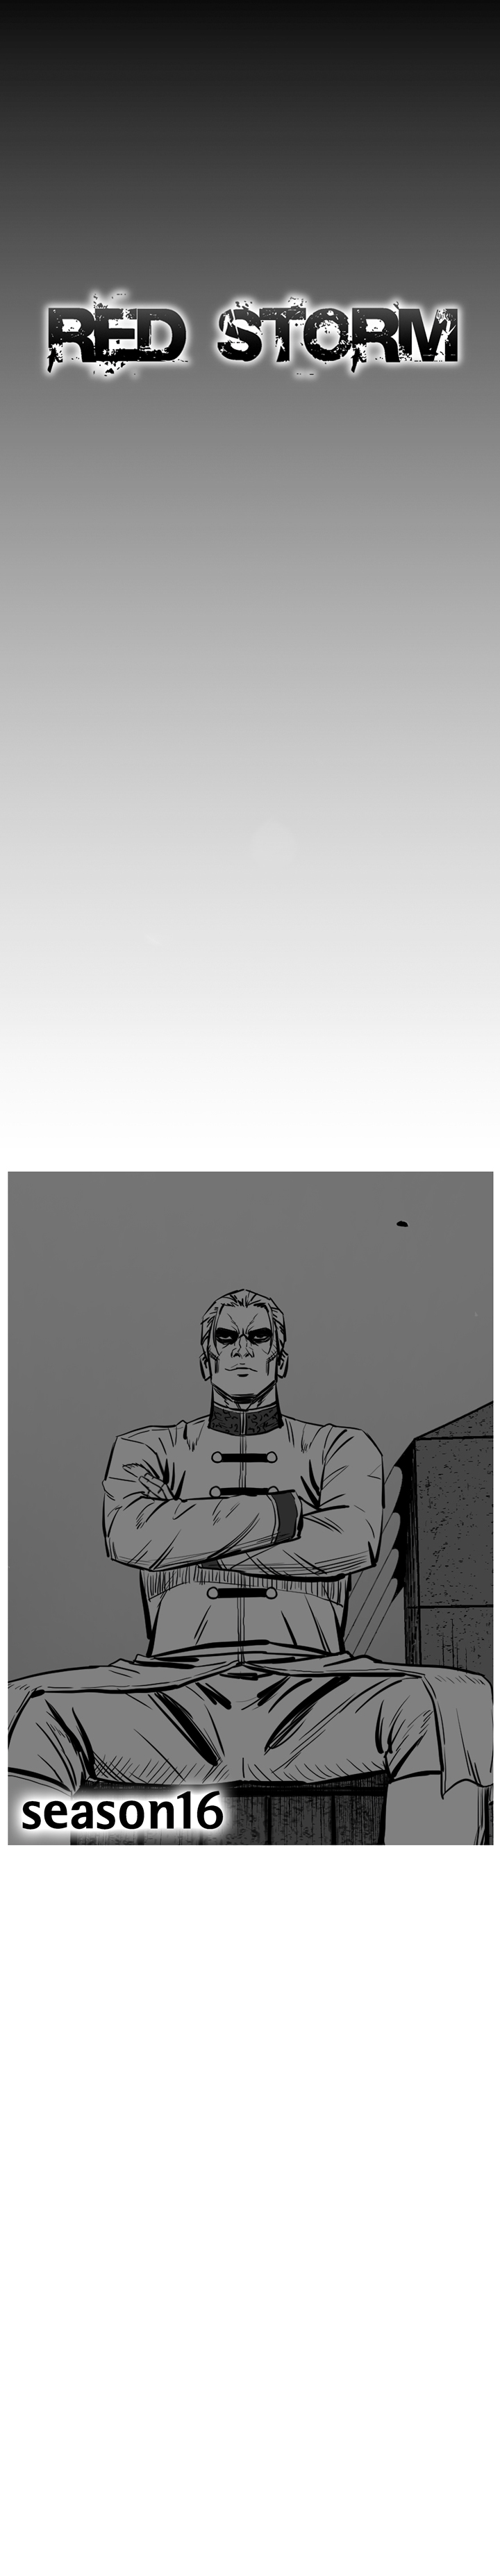 https://img2.nineanime.com/comics/pic2/19/403/933018/5d273677652ec19562d9db111abf46d3.jpg Page 1